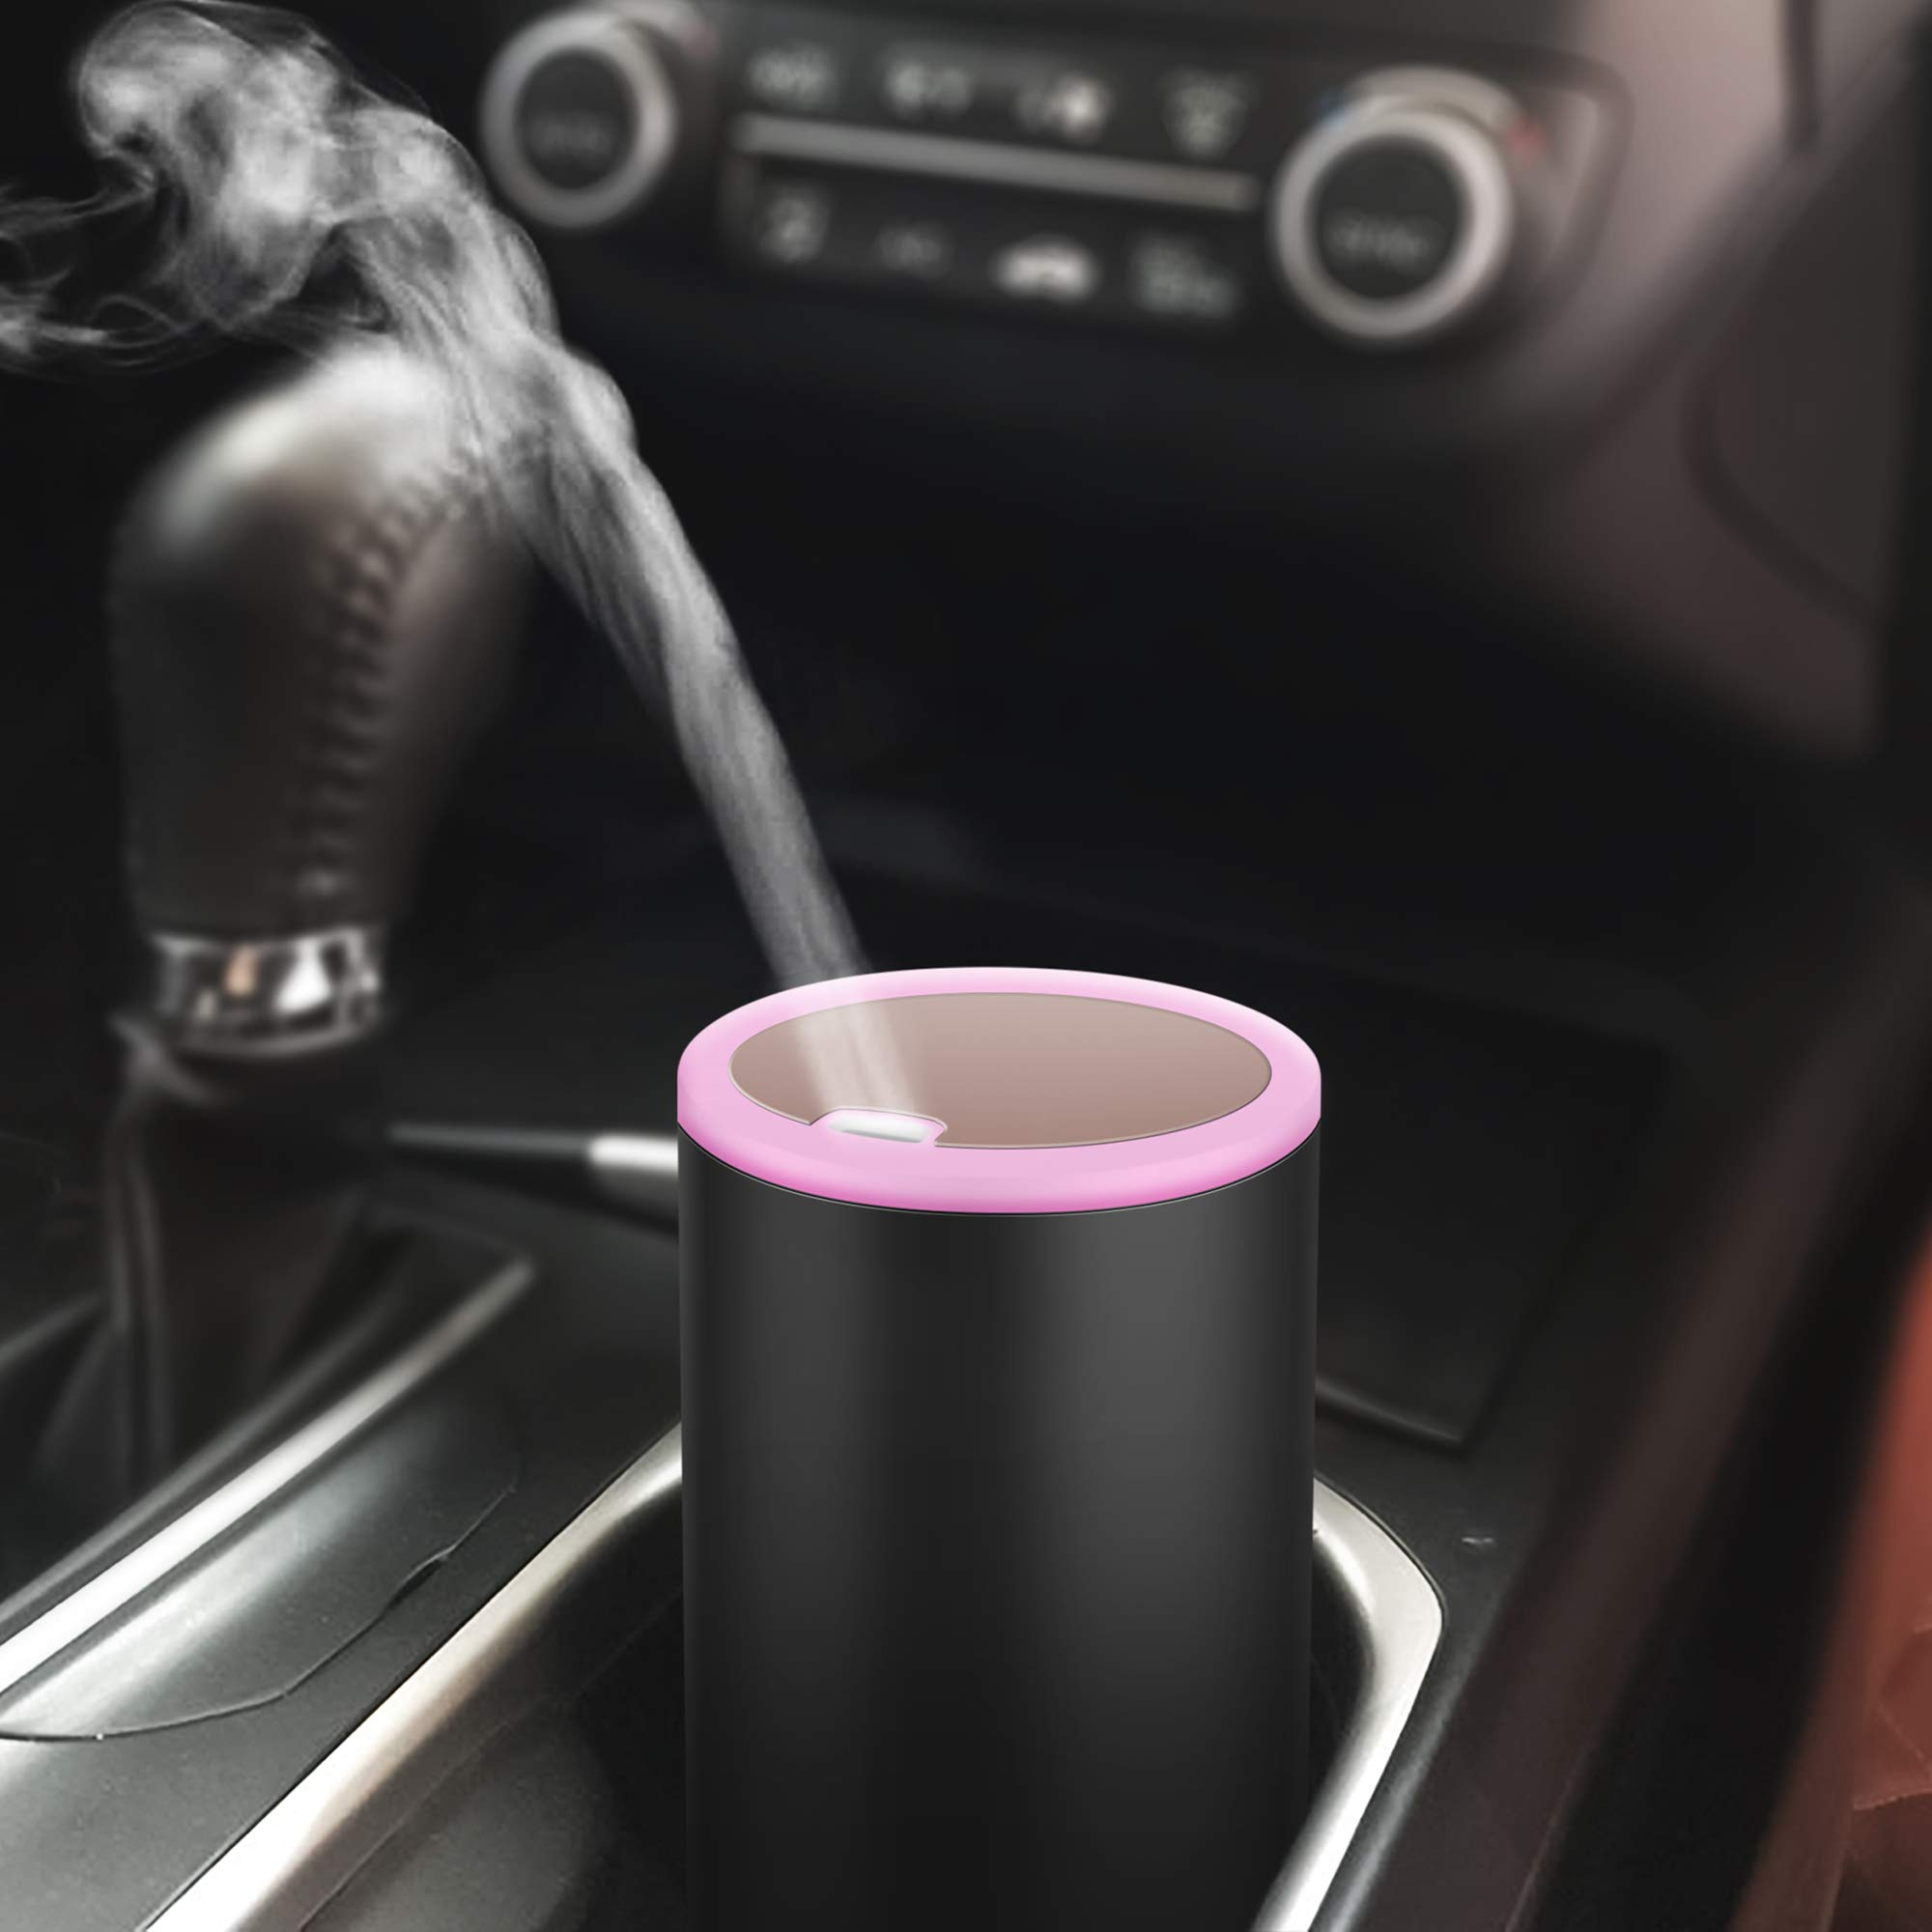 YJY Car None Sponge Wick Aromatherapy Intermittent